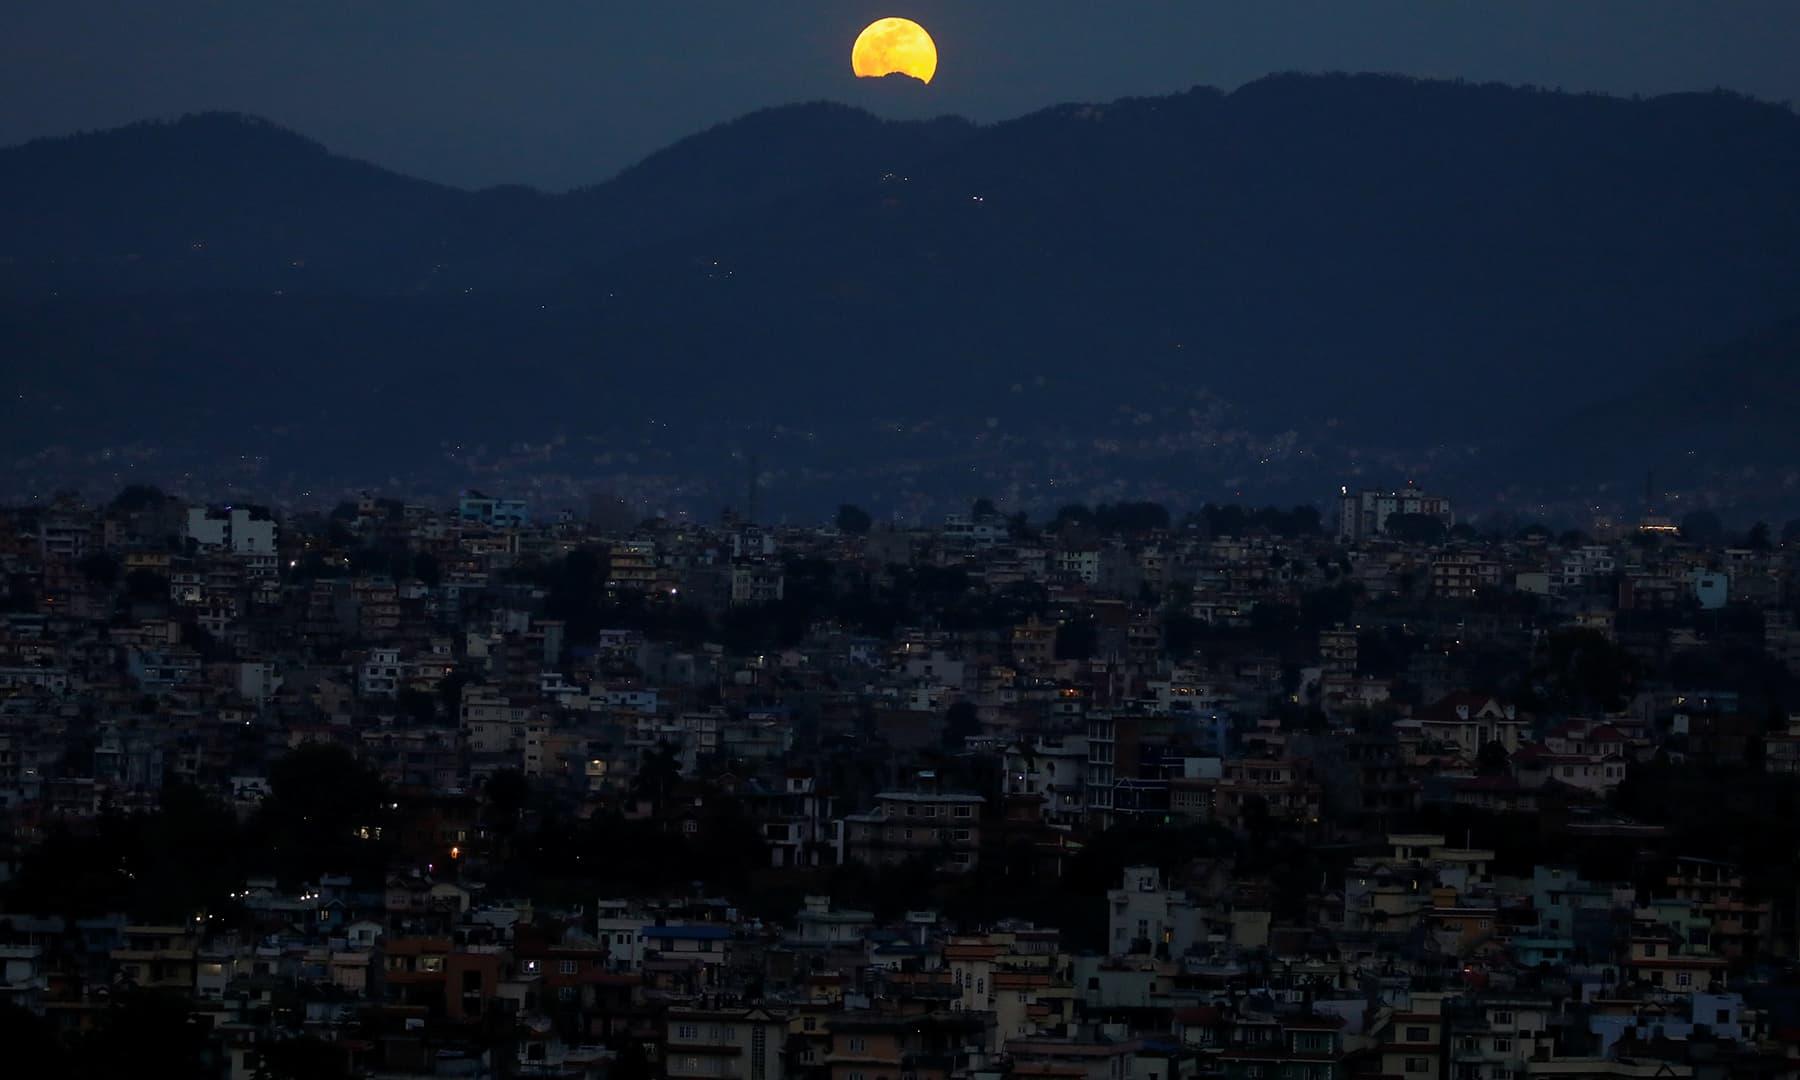 The full moon rises above the Kathmandu Valley in Kathmandu, Nepal. — Reuters